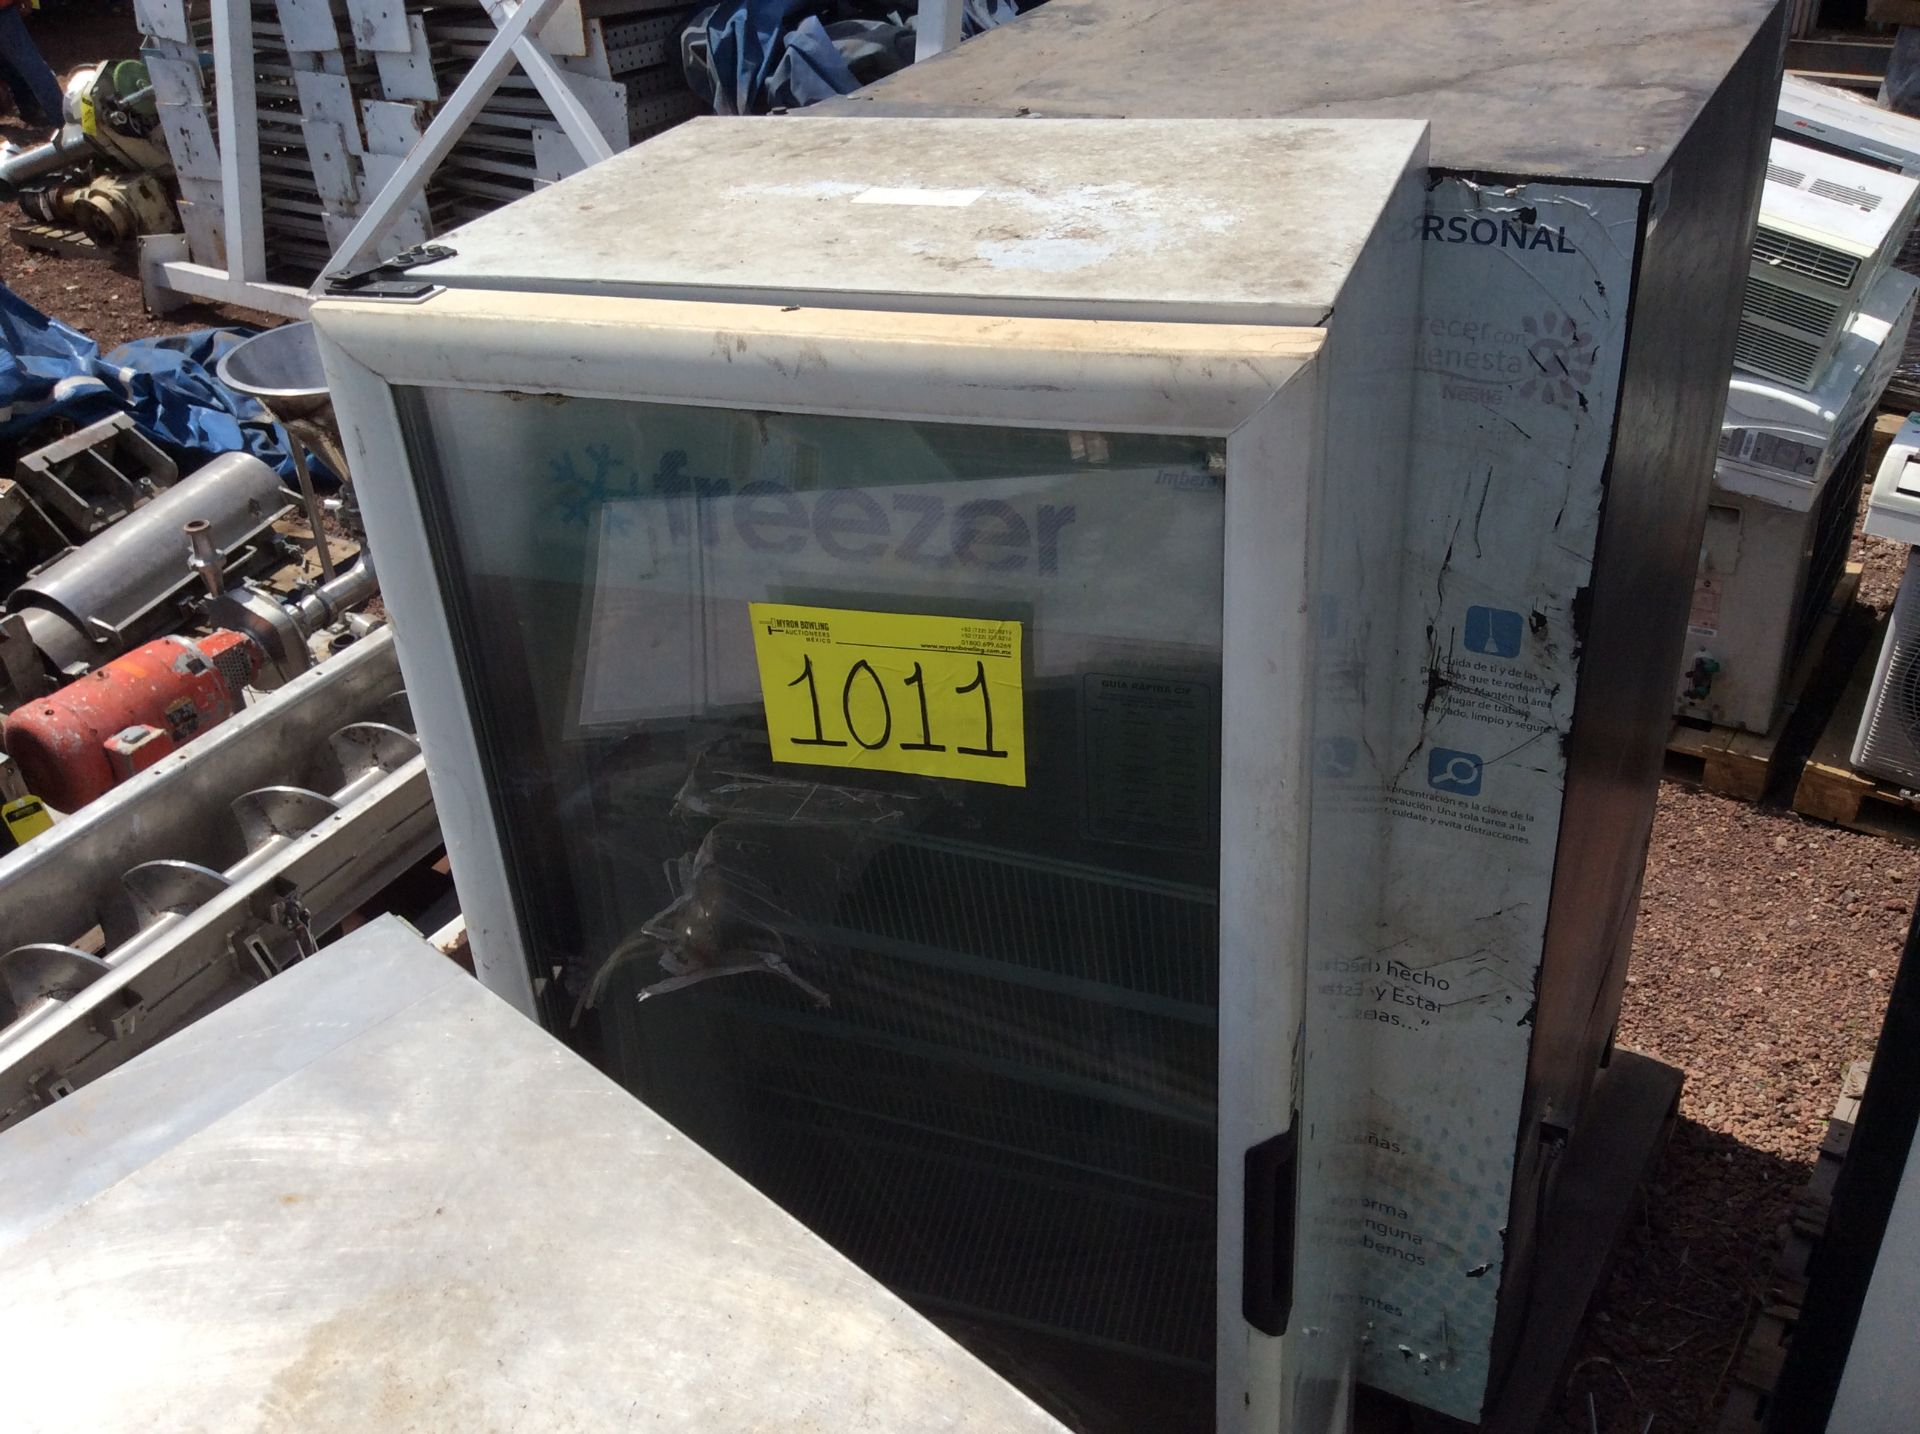 1 Ojeda refrigerator of double glass door model RV2P36 serial number 0636323-34305 120V - Image 13 of 14